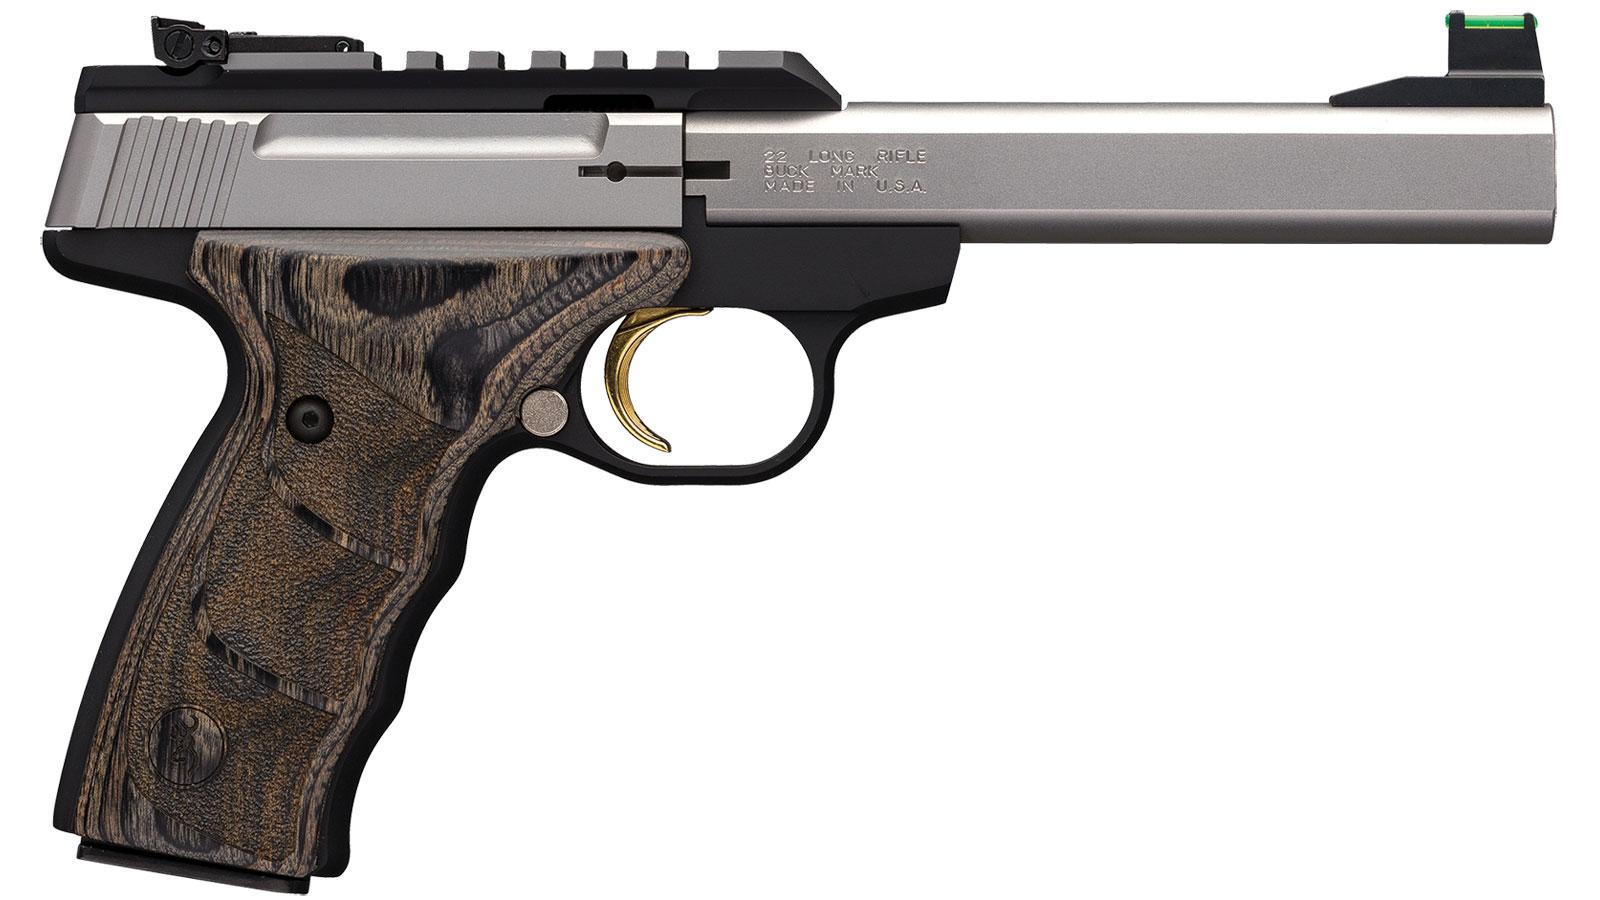 Browning 051531490 Buck Mark Plus 22 Long Rifle (LR) Single 5.5 10+1 Laminate Black Wood UDX Grip Black Aluminum Alloy Frame Stainless Steel Slide in.